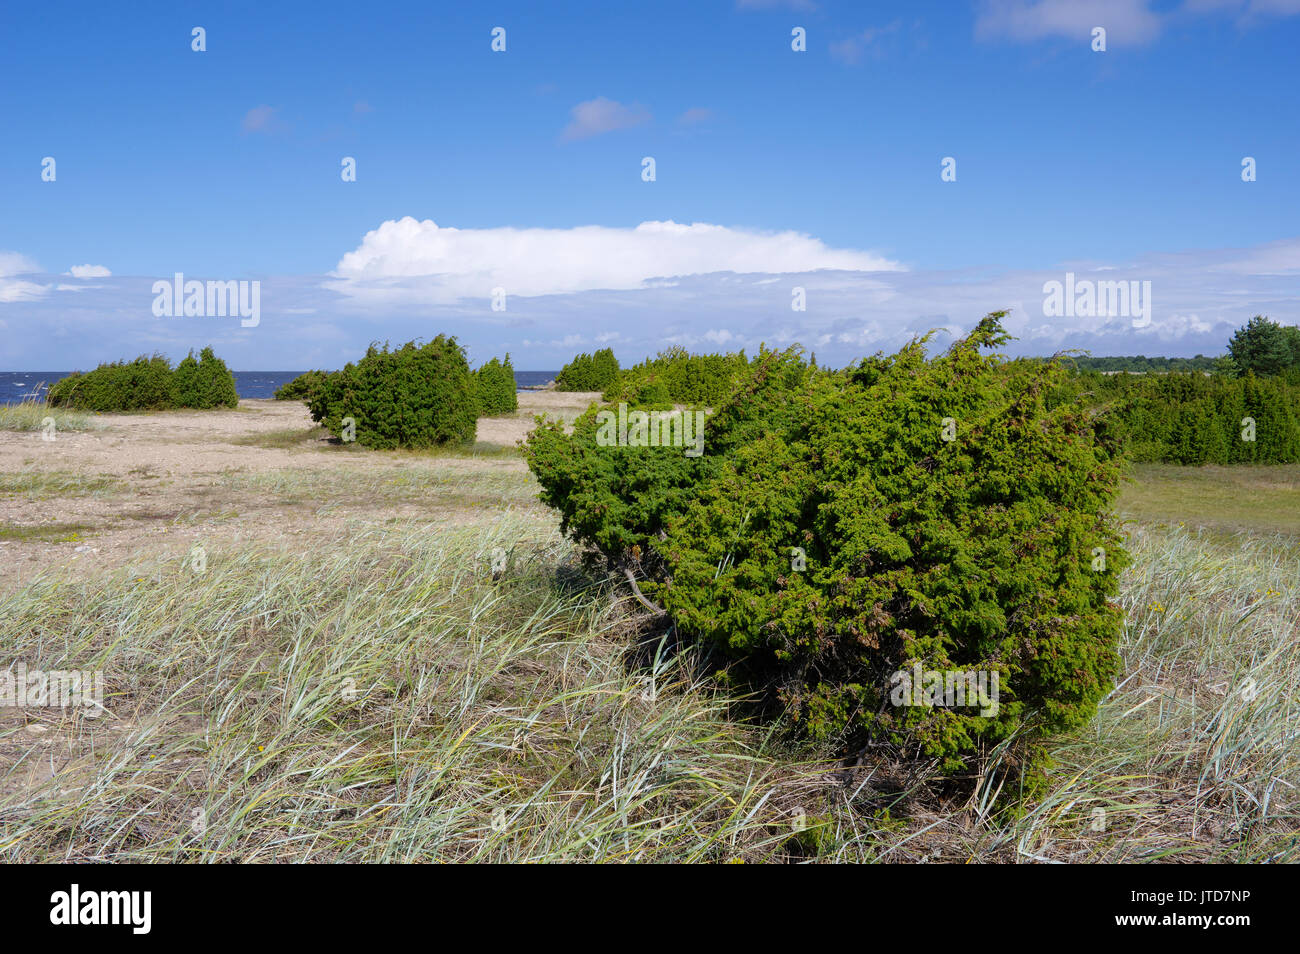 Kihnu junipers. Islland Kihnu. Estonia, Baltic States, 5th August 2017 - Stock Image